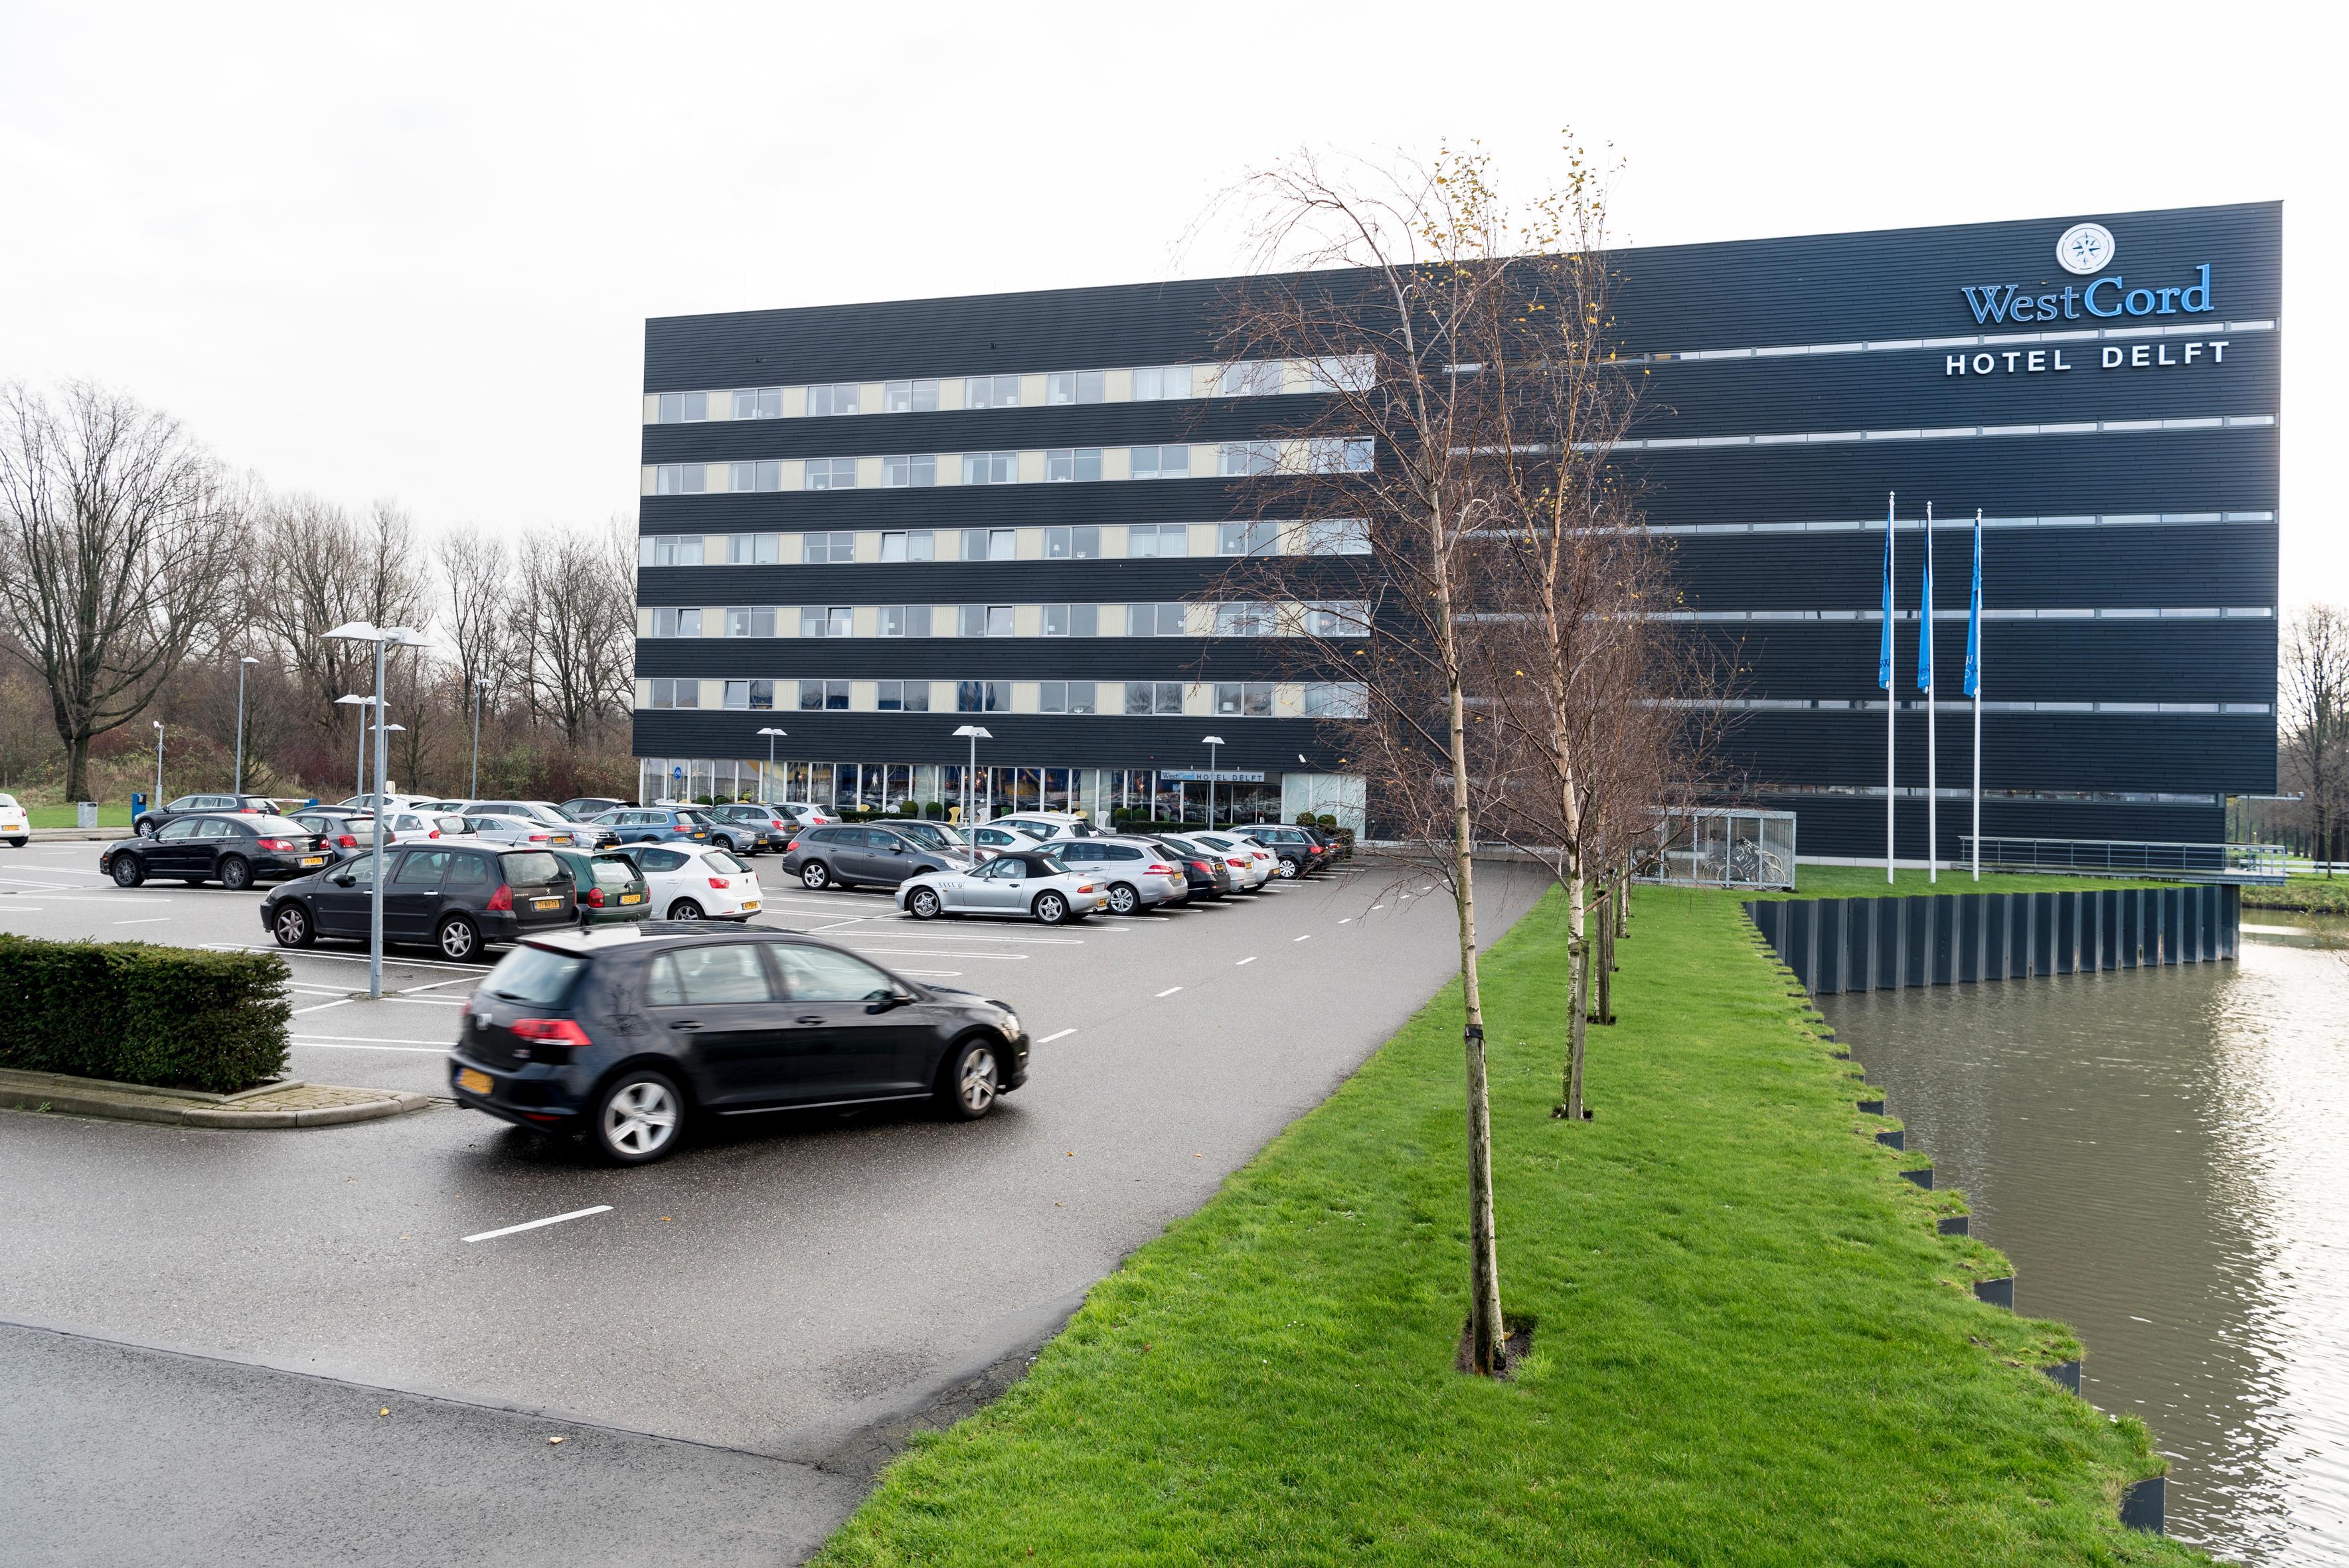 Westcord Delft, Delft